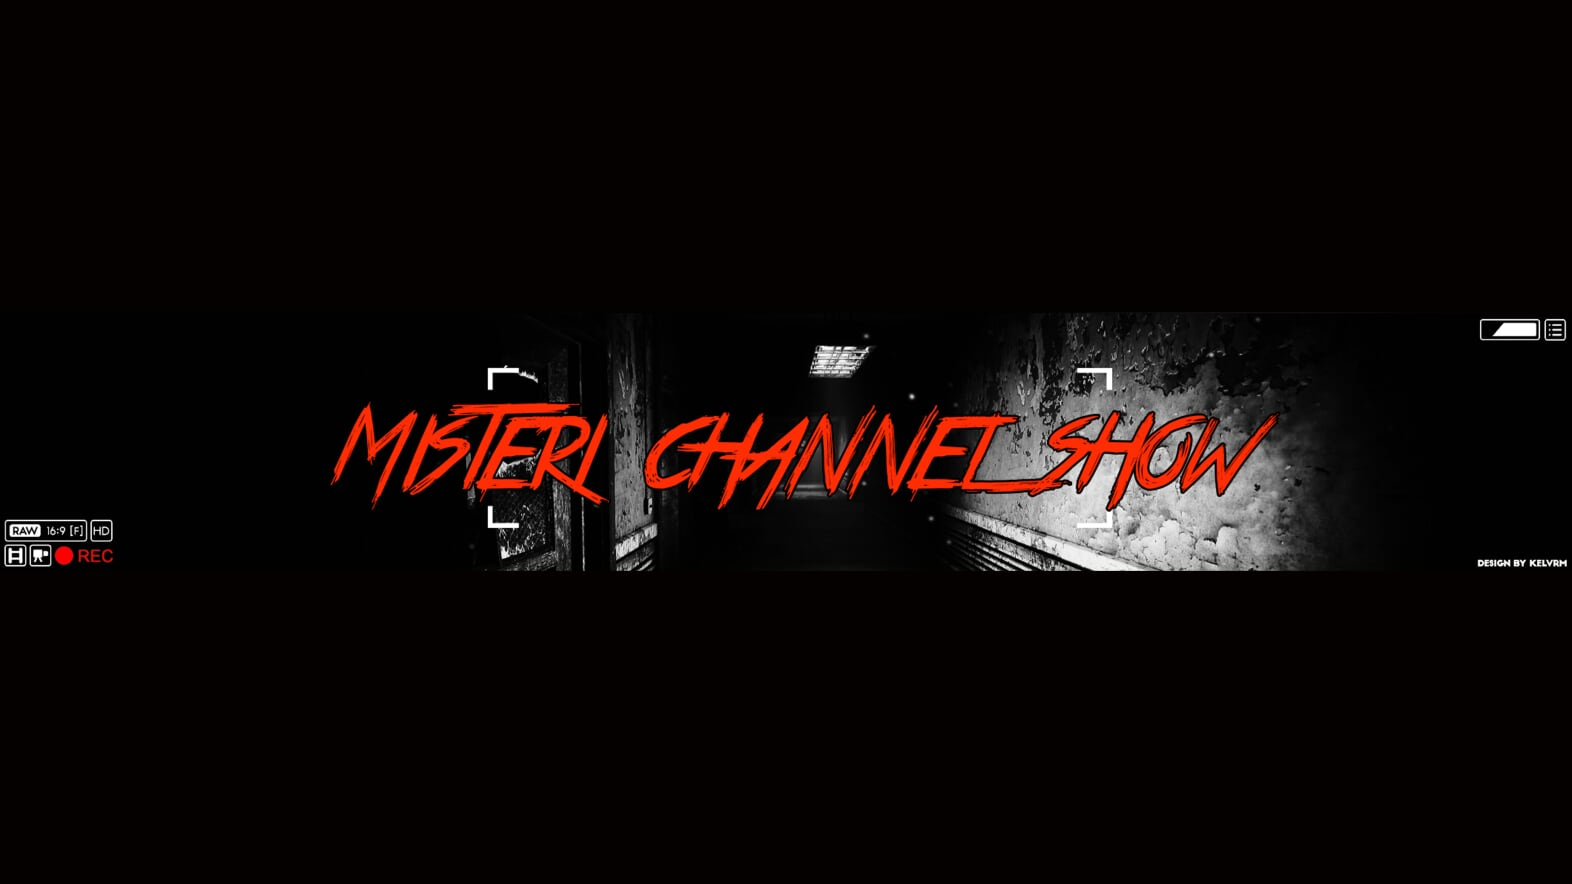 Misteri Channel Show